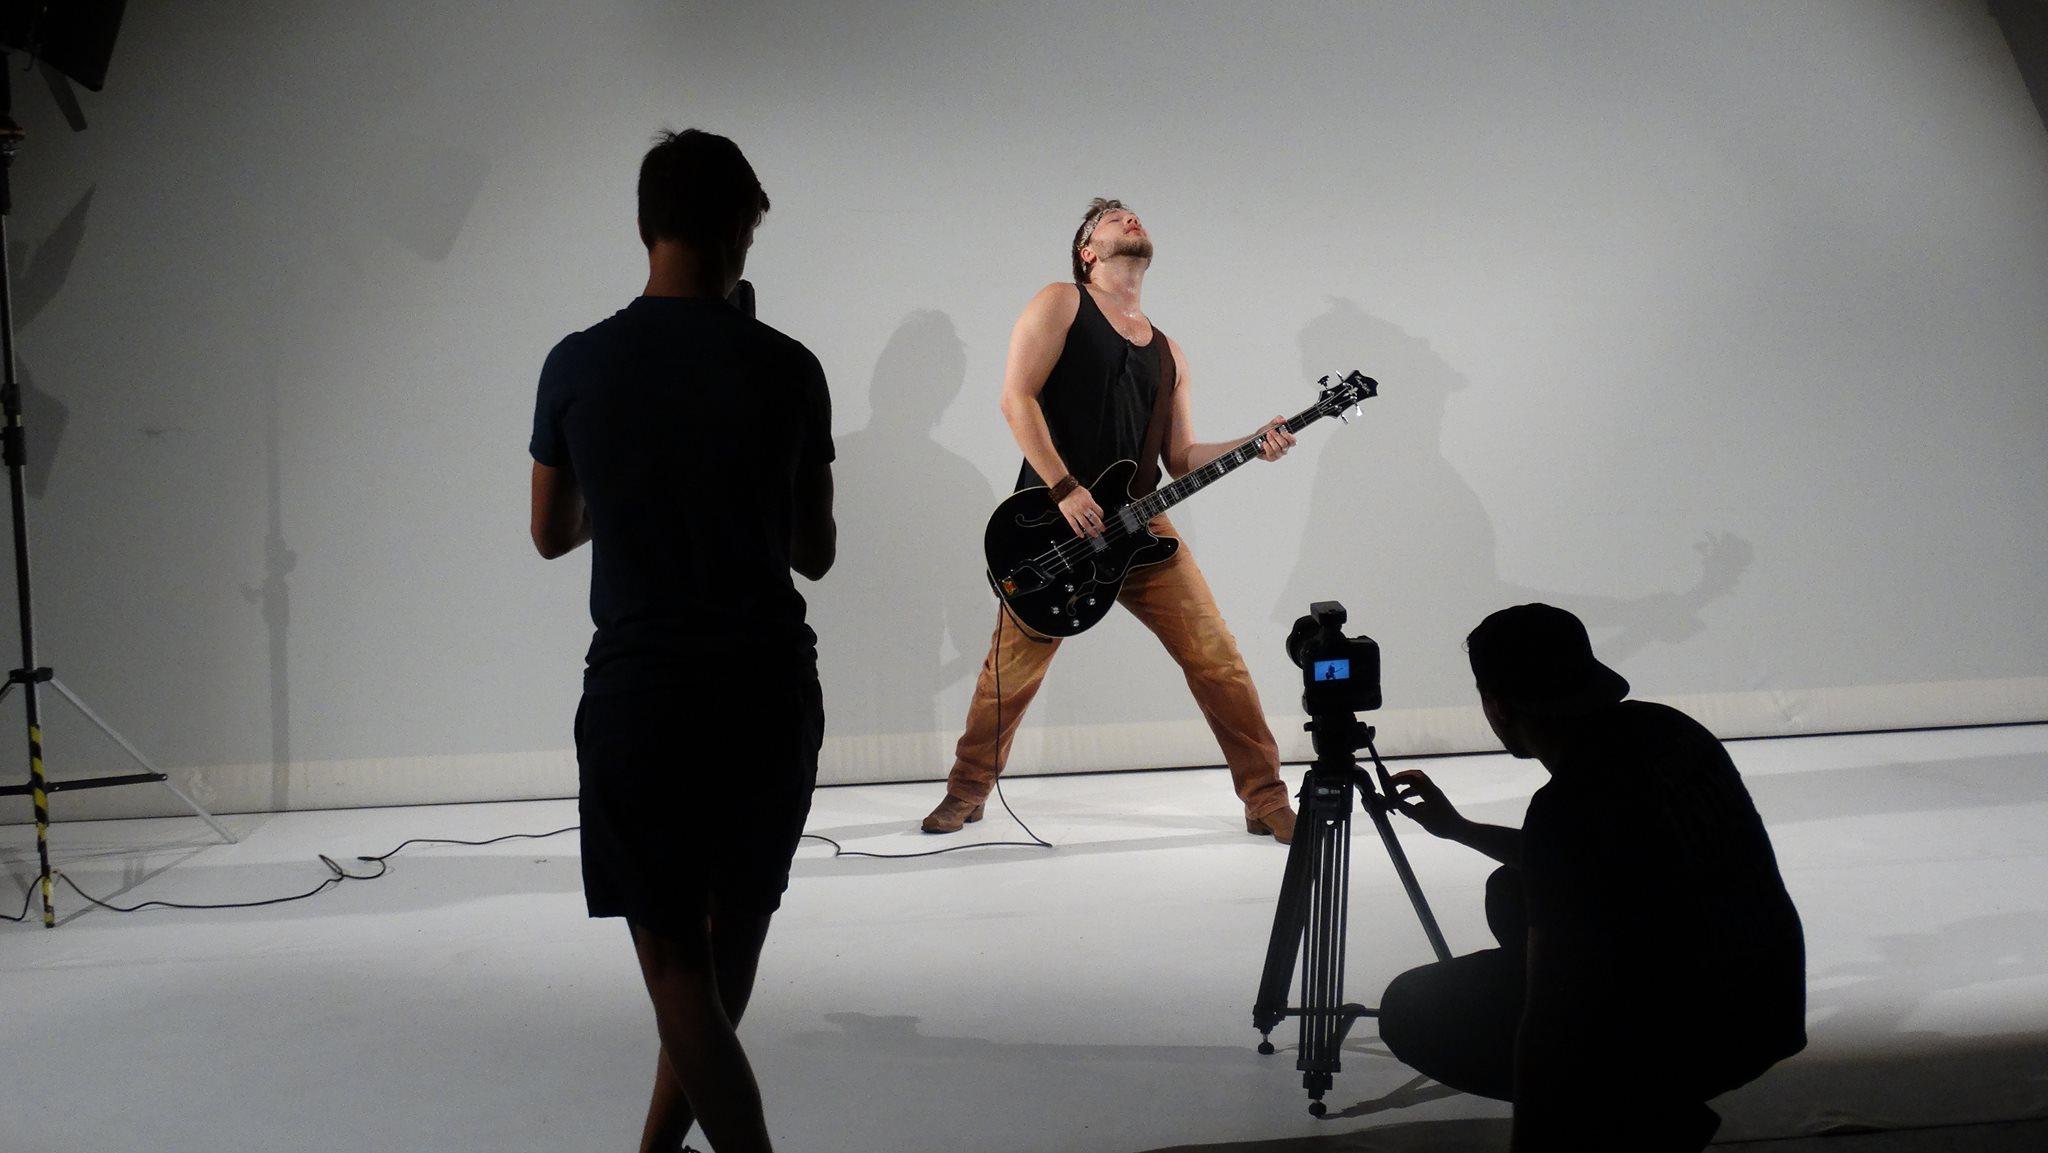 Videografie Jena Musikvideo